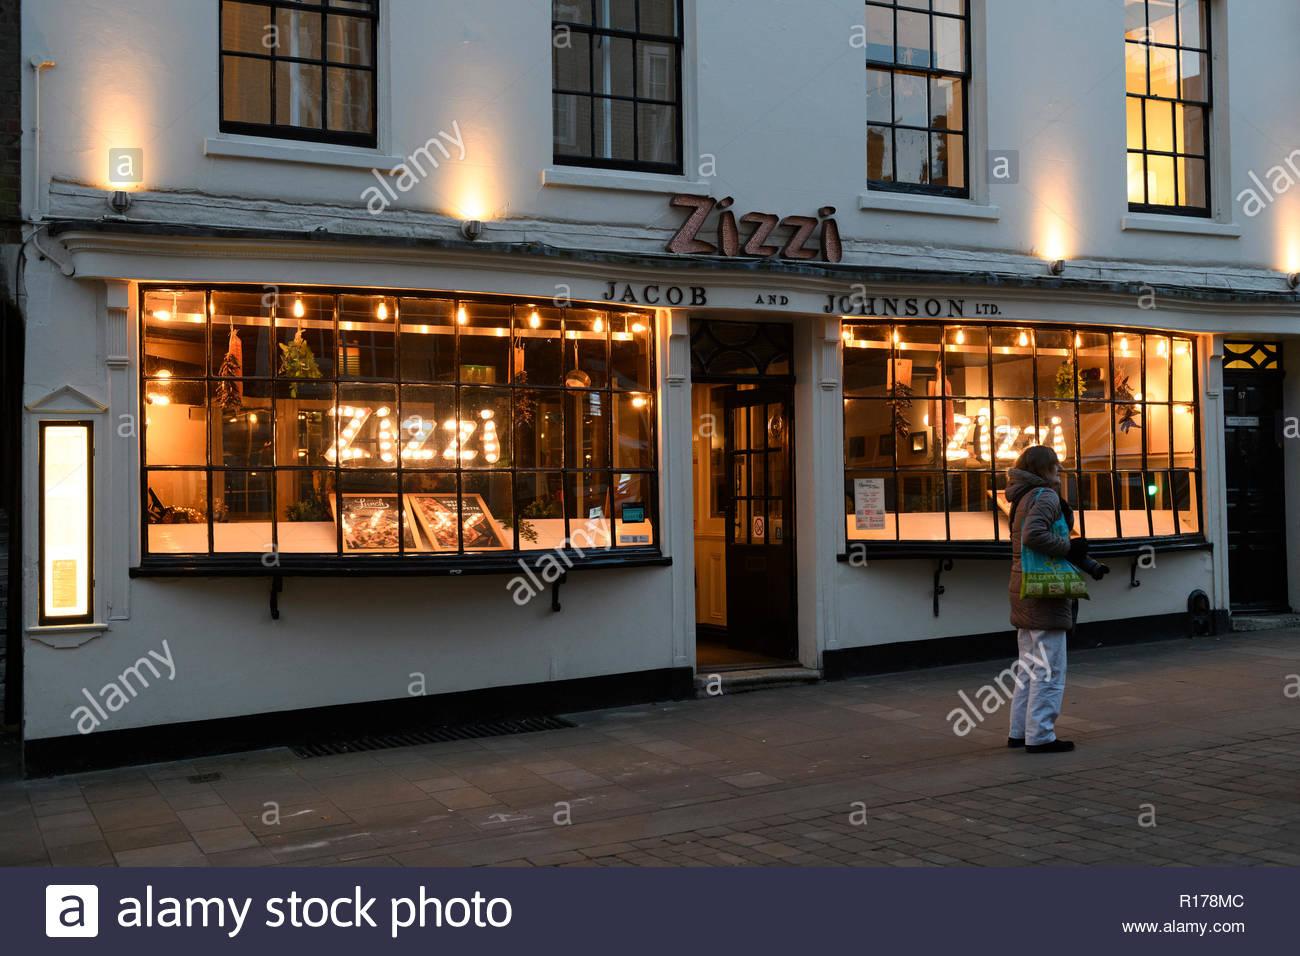 Zizzi Italian Restaurant, High St, Winchester, Hampshire, England, UK - Stock Image